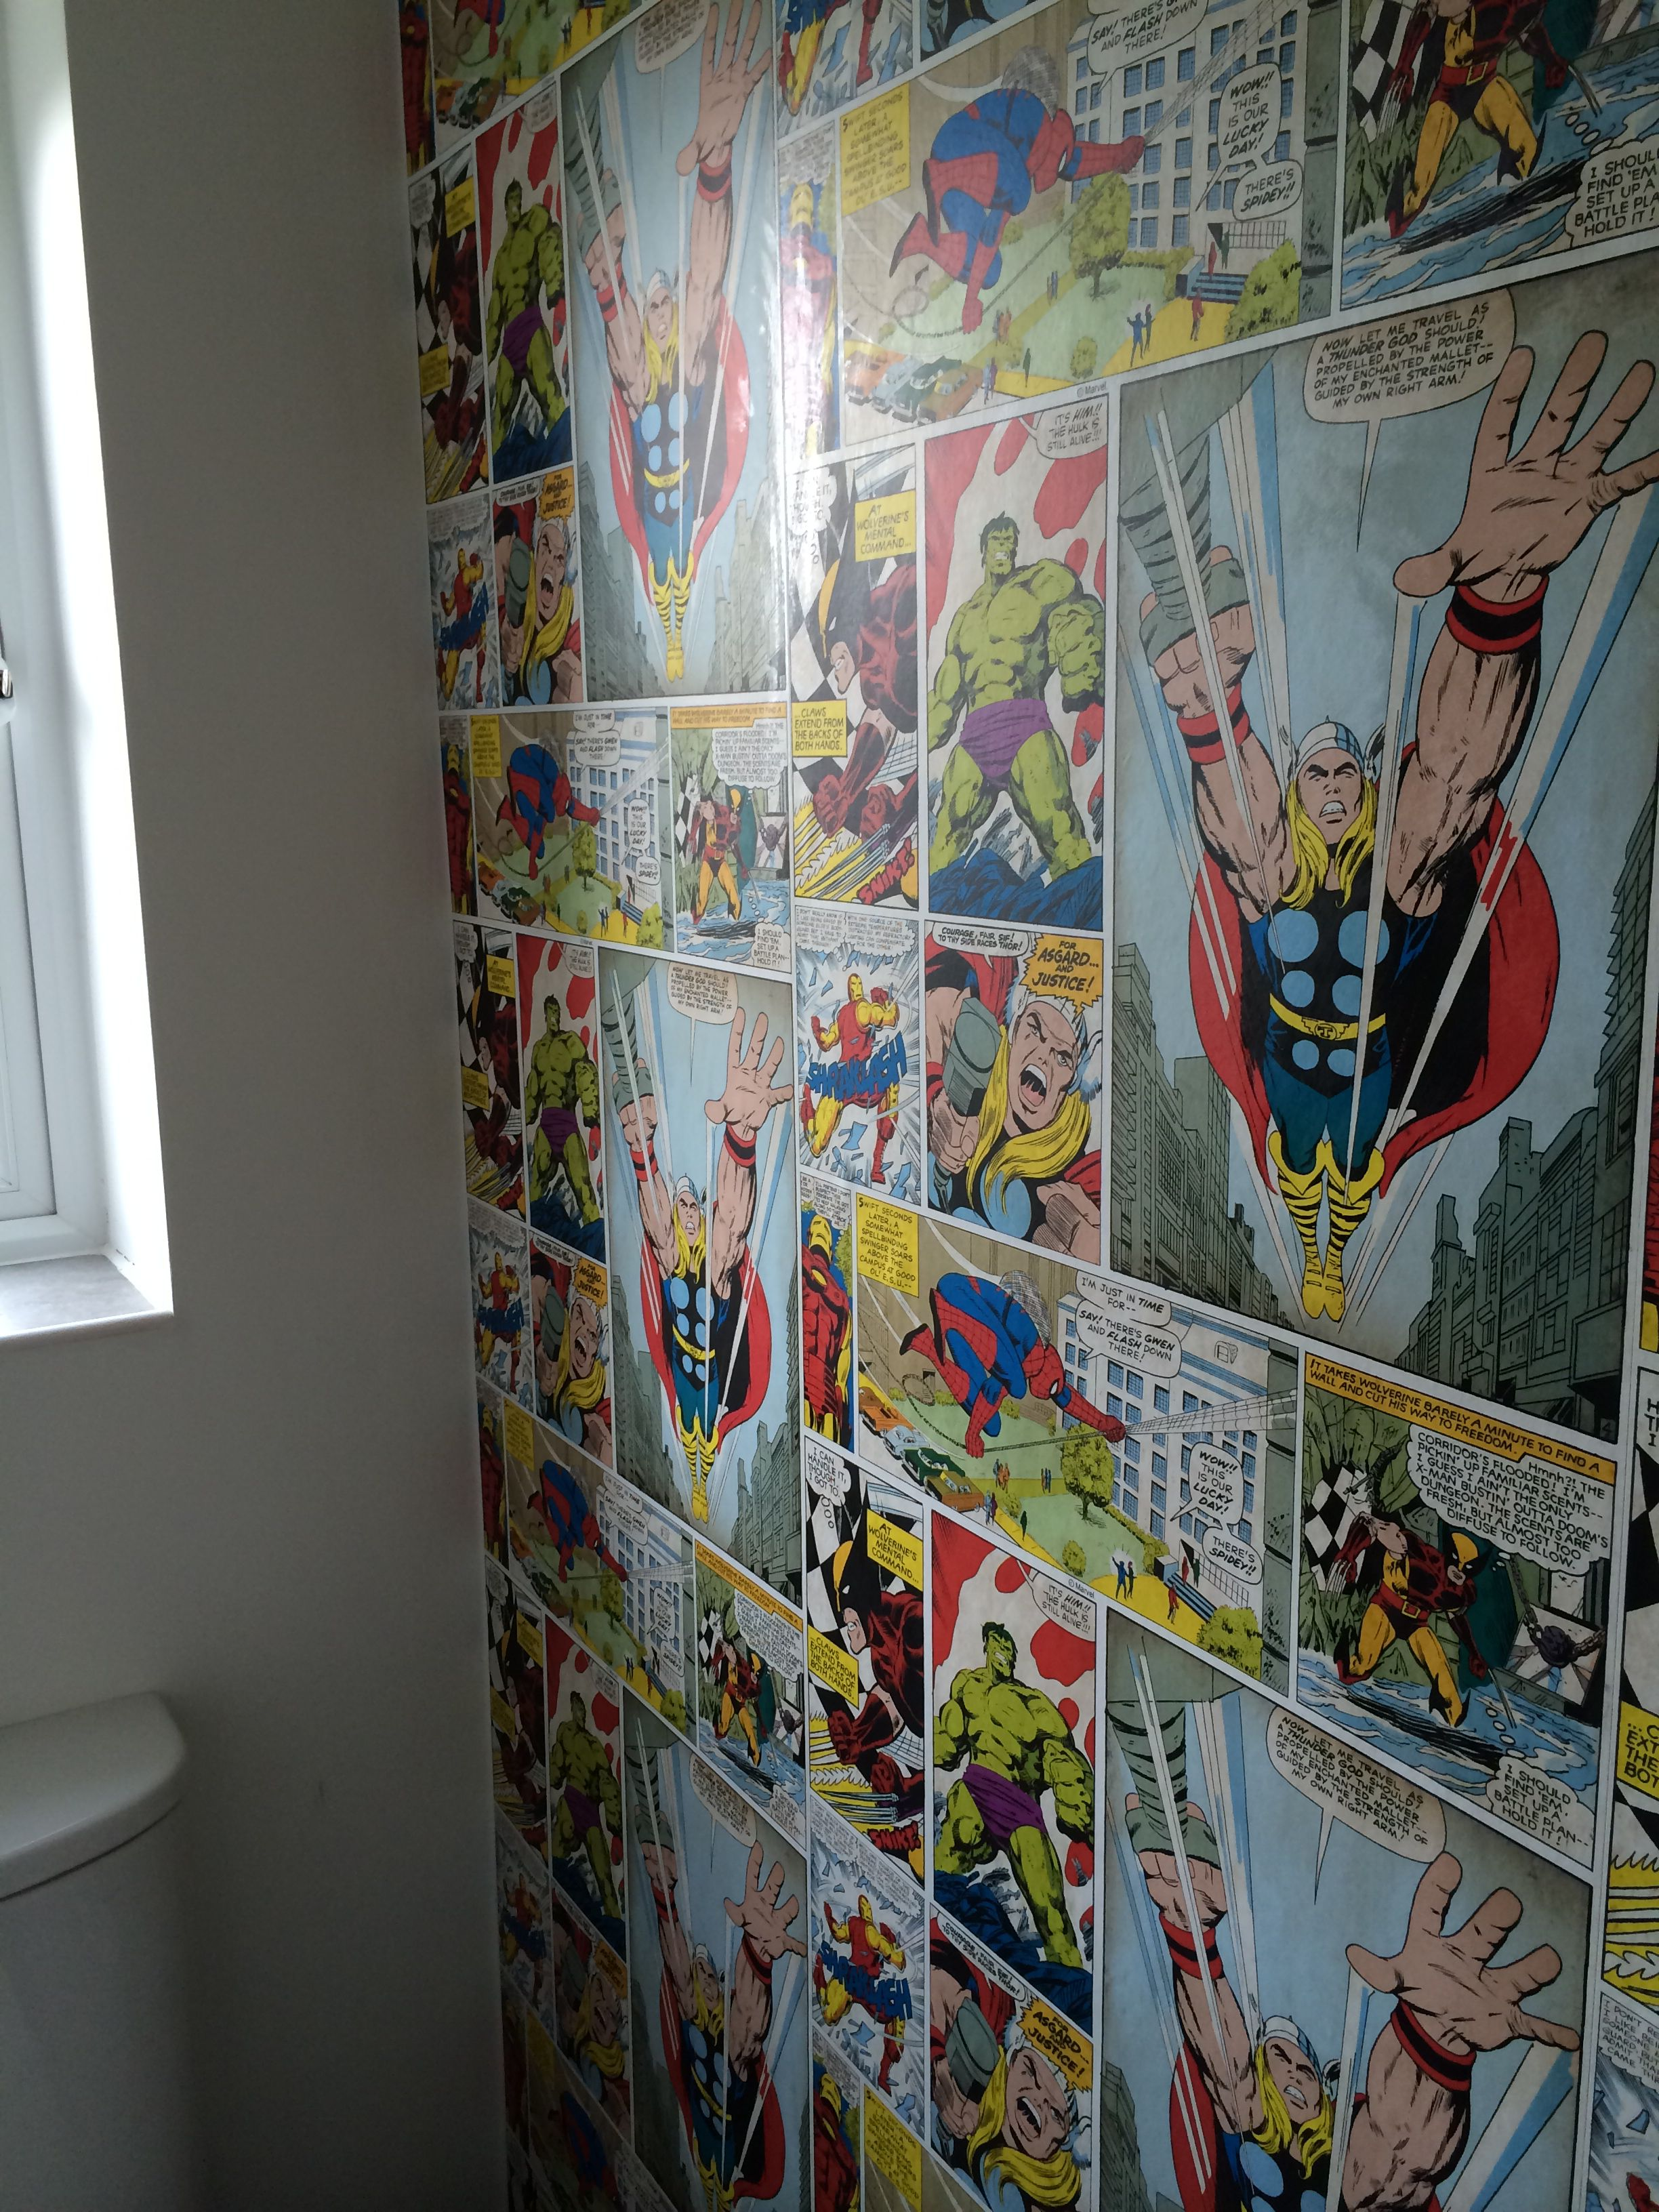 Cool Wallpaper Marvel Wall - cbd249280b0a43105620f9d2c2688eff  Trends_249369.jpg